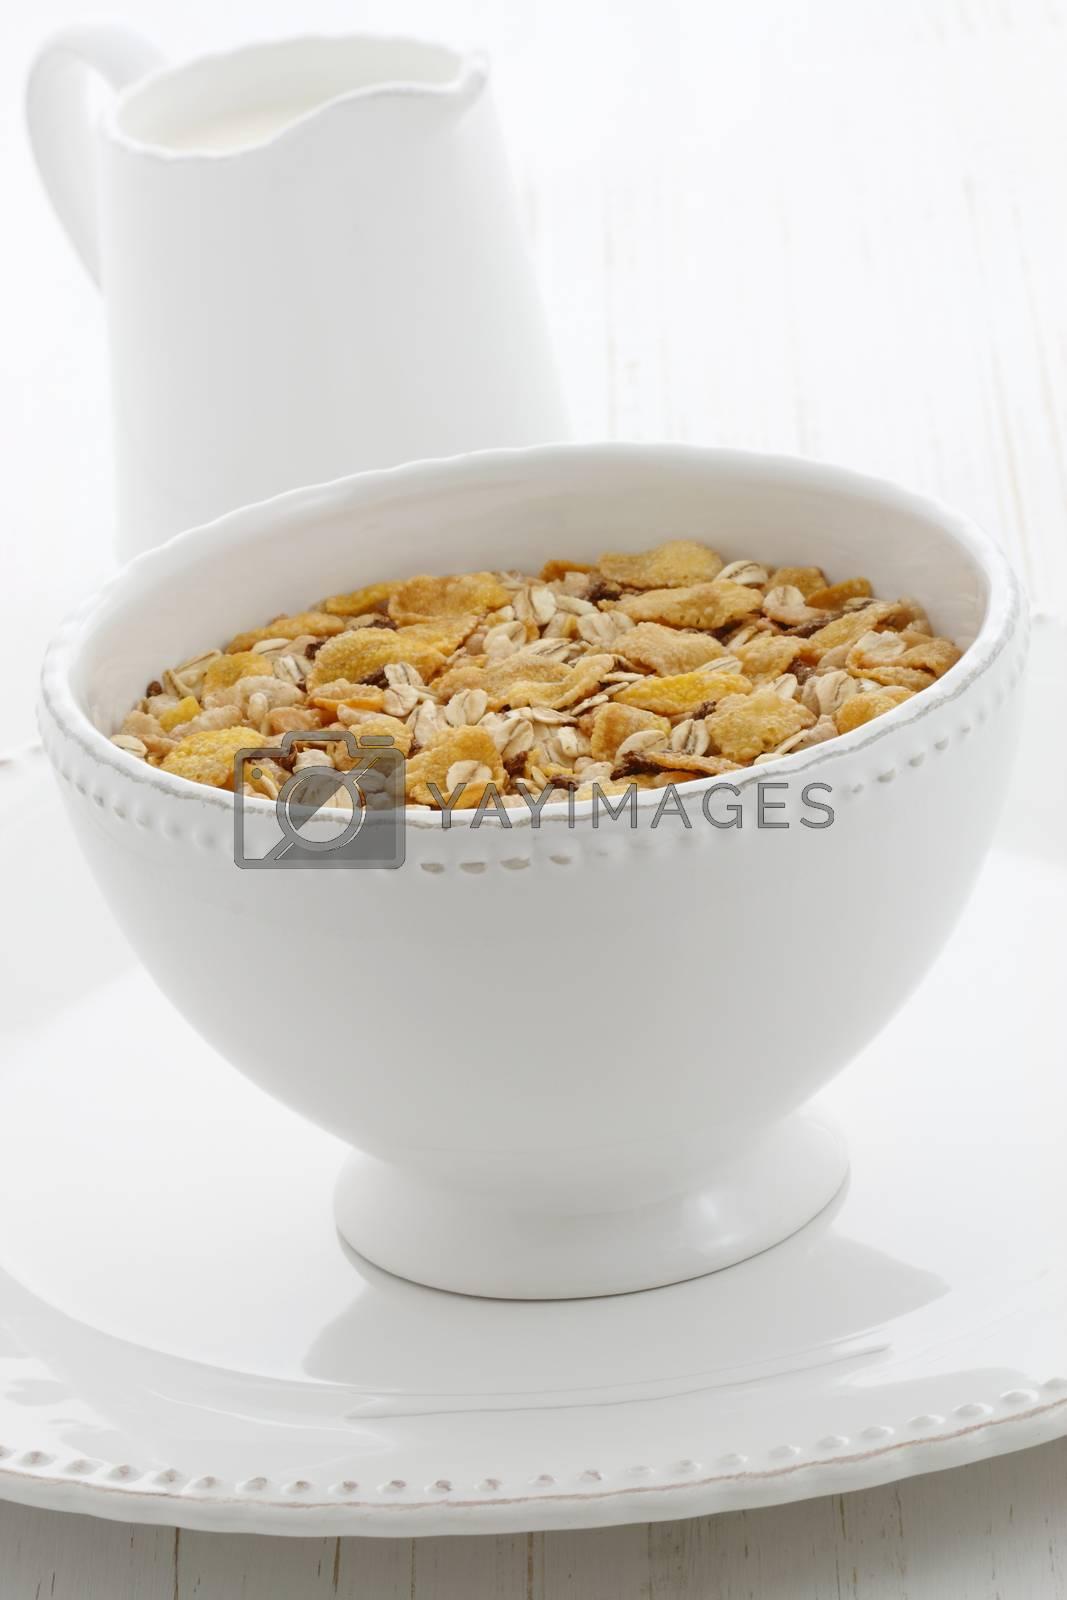 Delicious and healthy granola cereal  by tacar